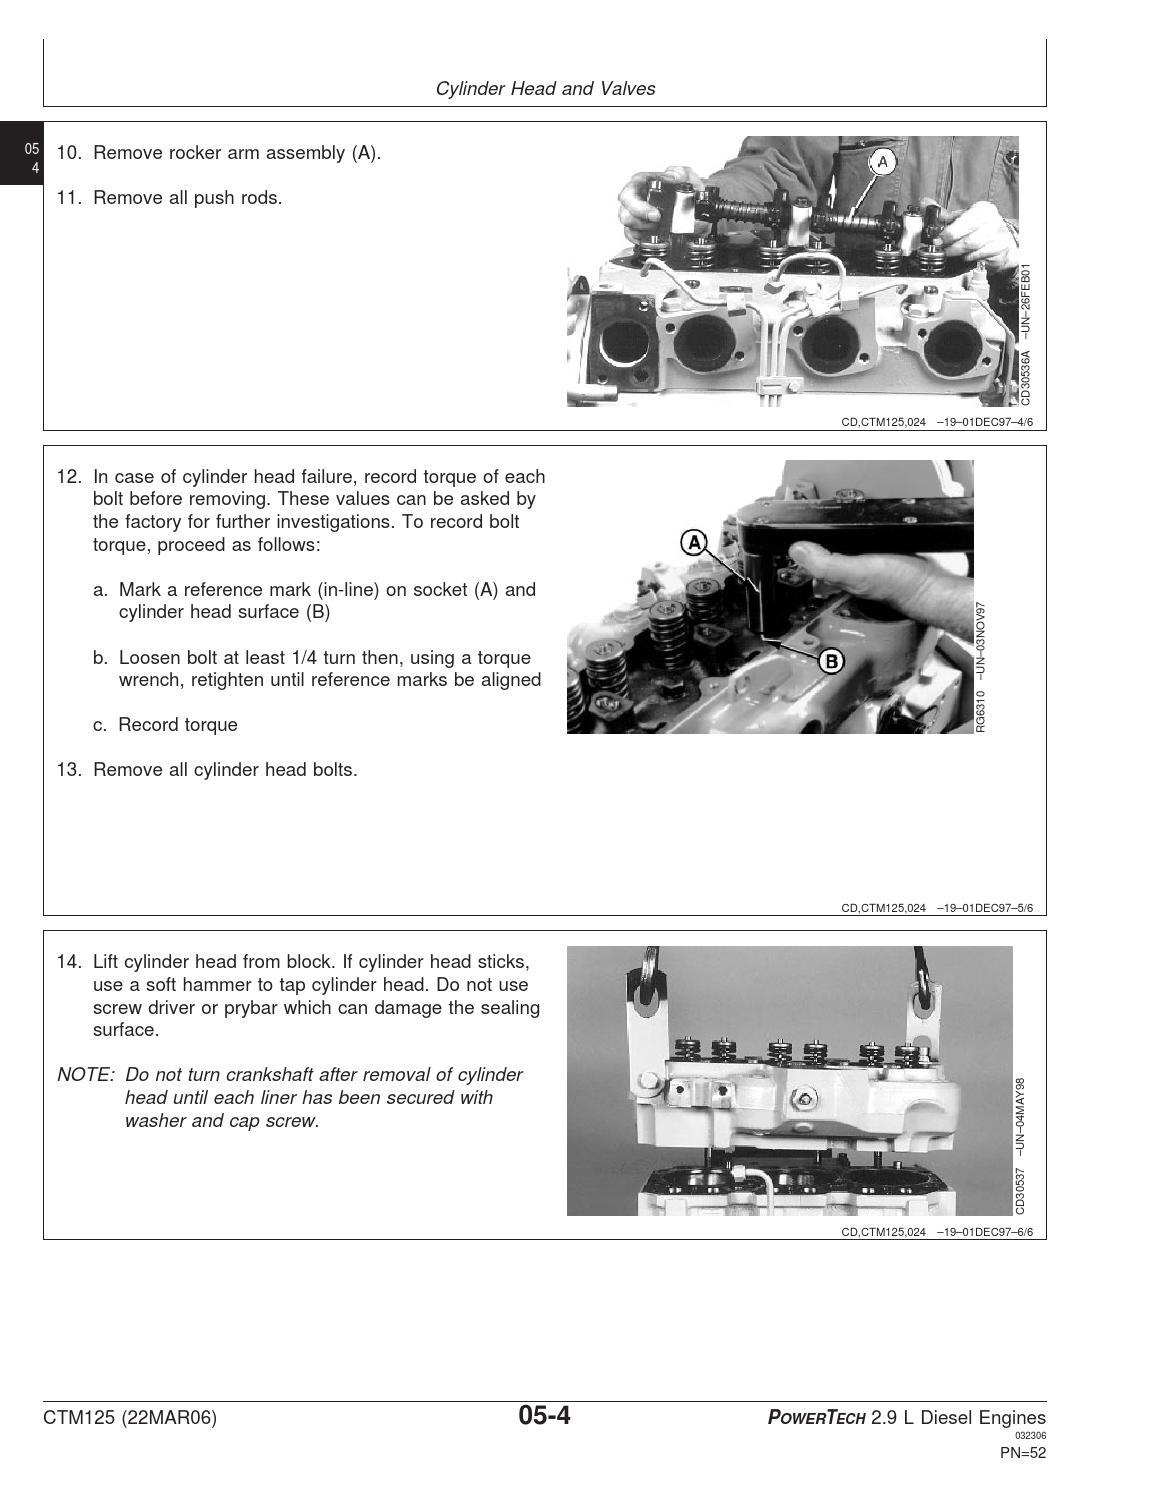 JOHN DEERE WORKSHOP MANUAL FOR ENGINE 3029 by Power Generation - issuu